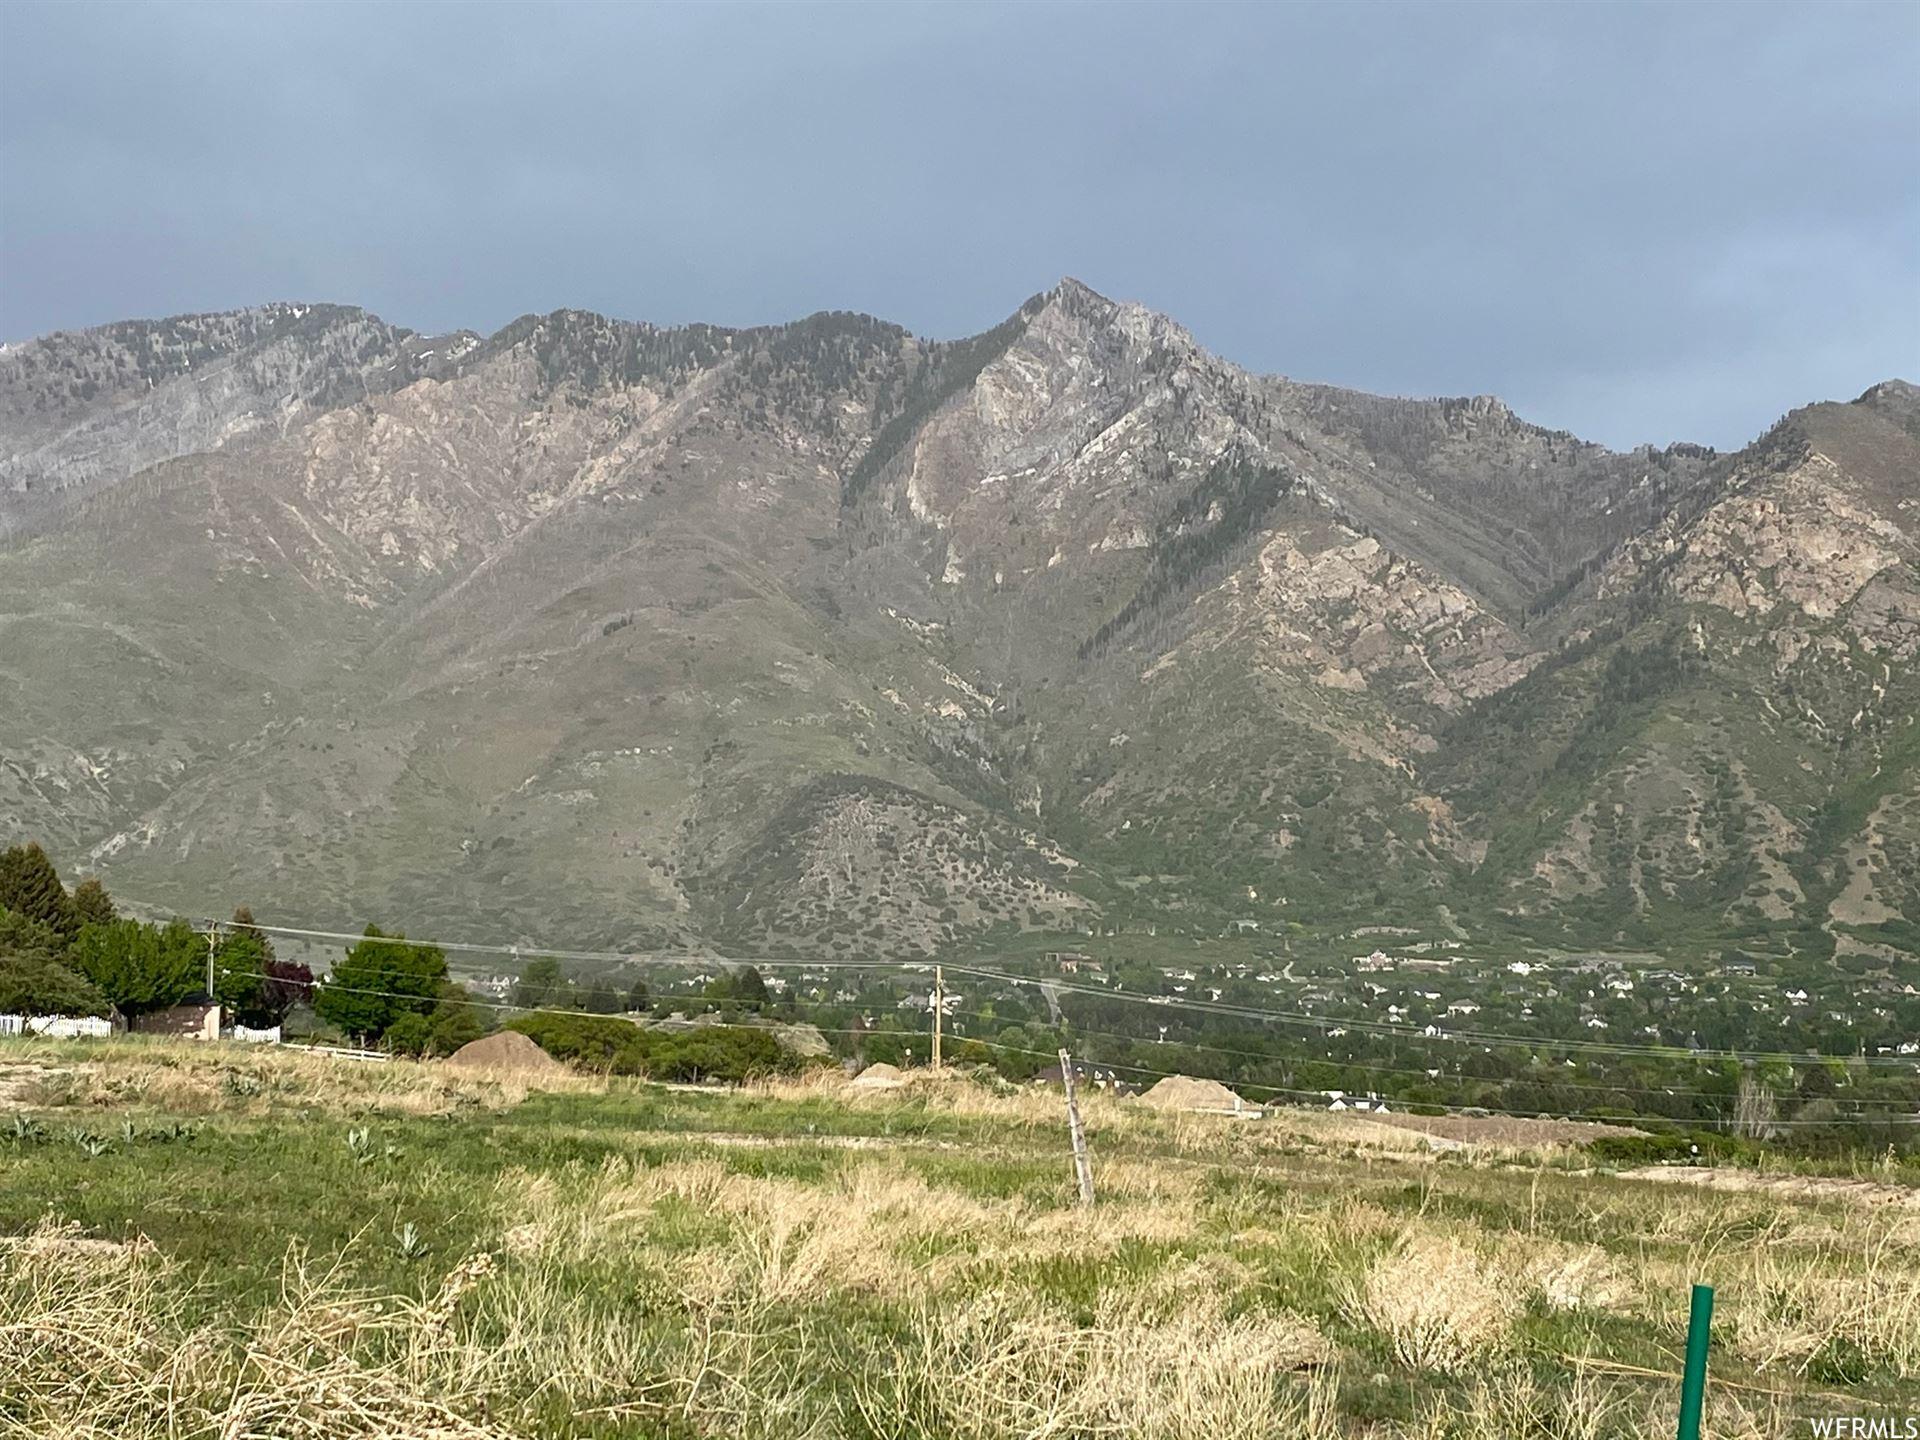 Photo of 420 N BLUE SPRUCE RD #14, Alpine, UT 84004 (MLS # 1775130)